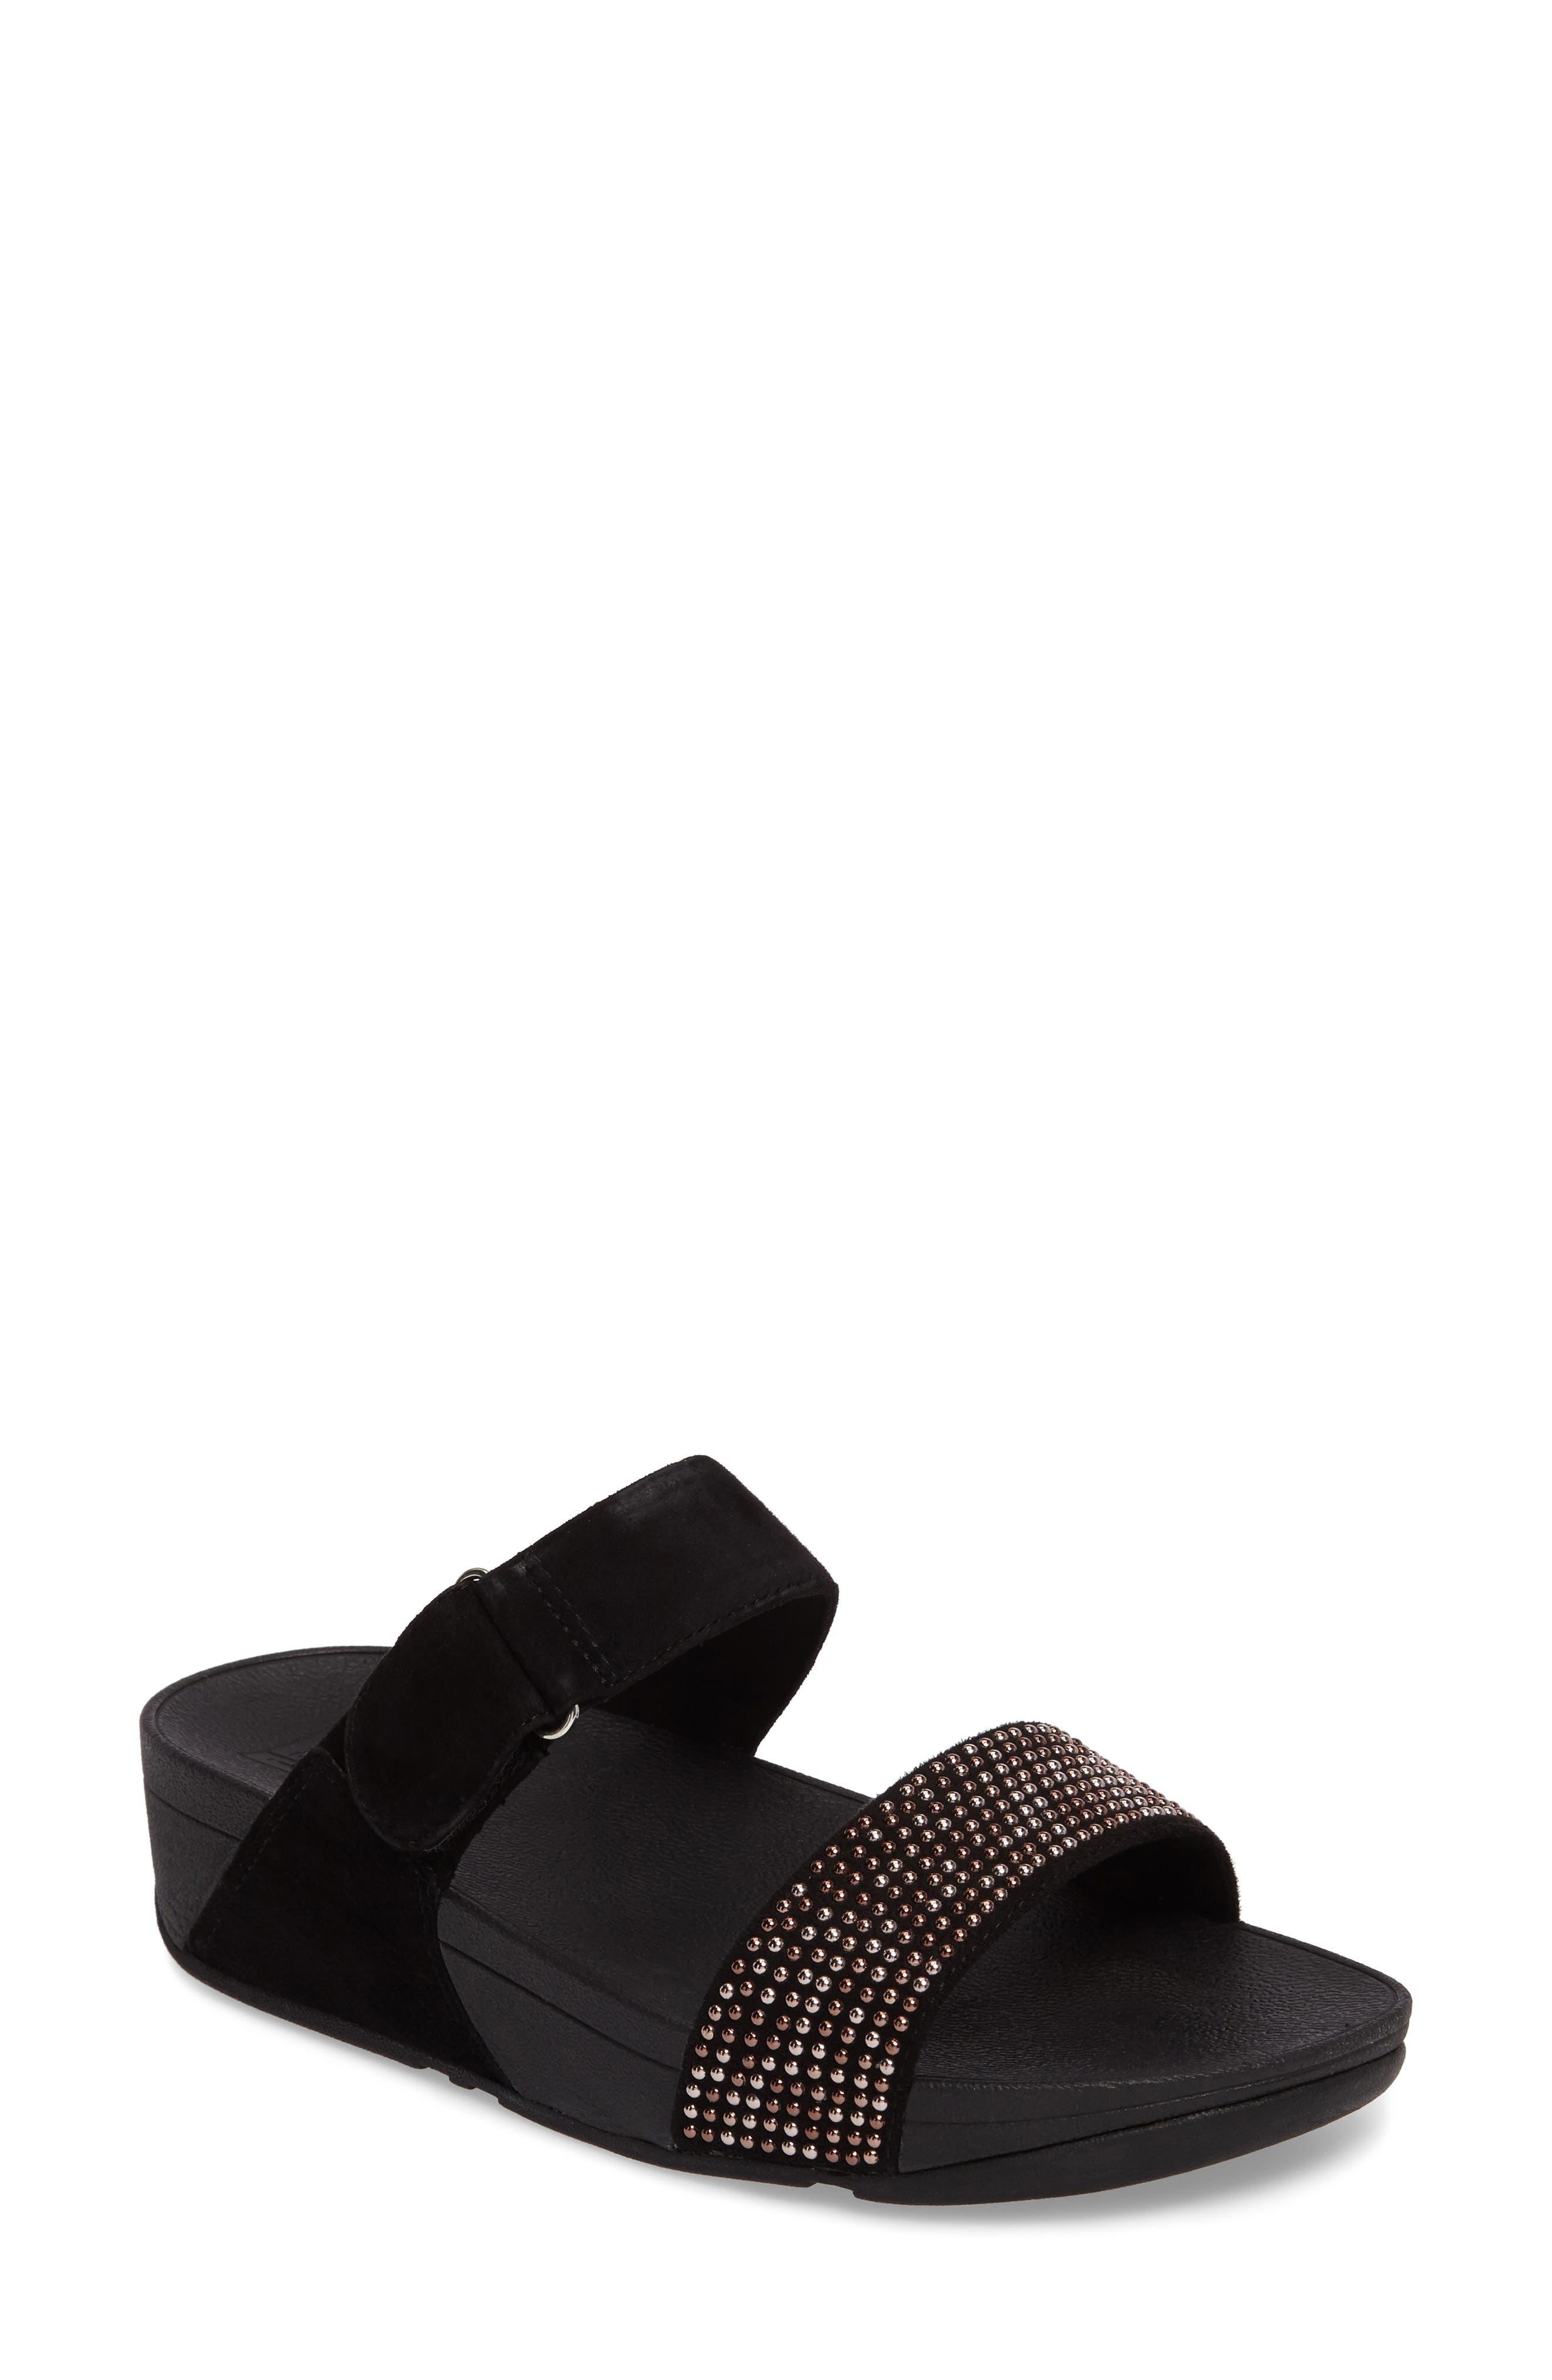 Lulu Popstud Wedge Slide Sandal,                         Main,                         color, Black Fabric